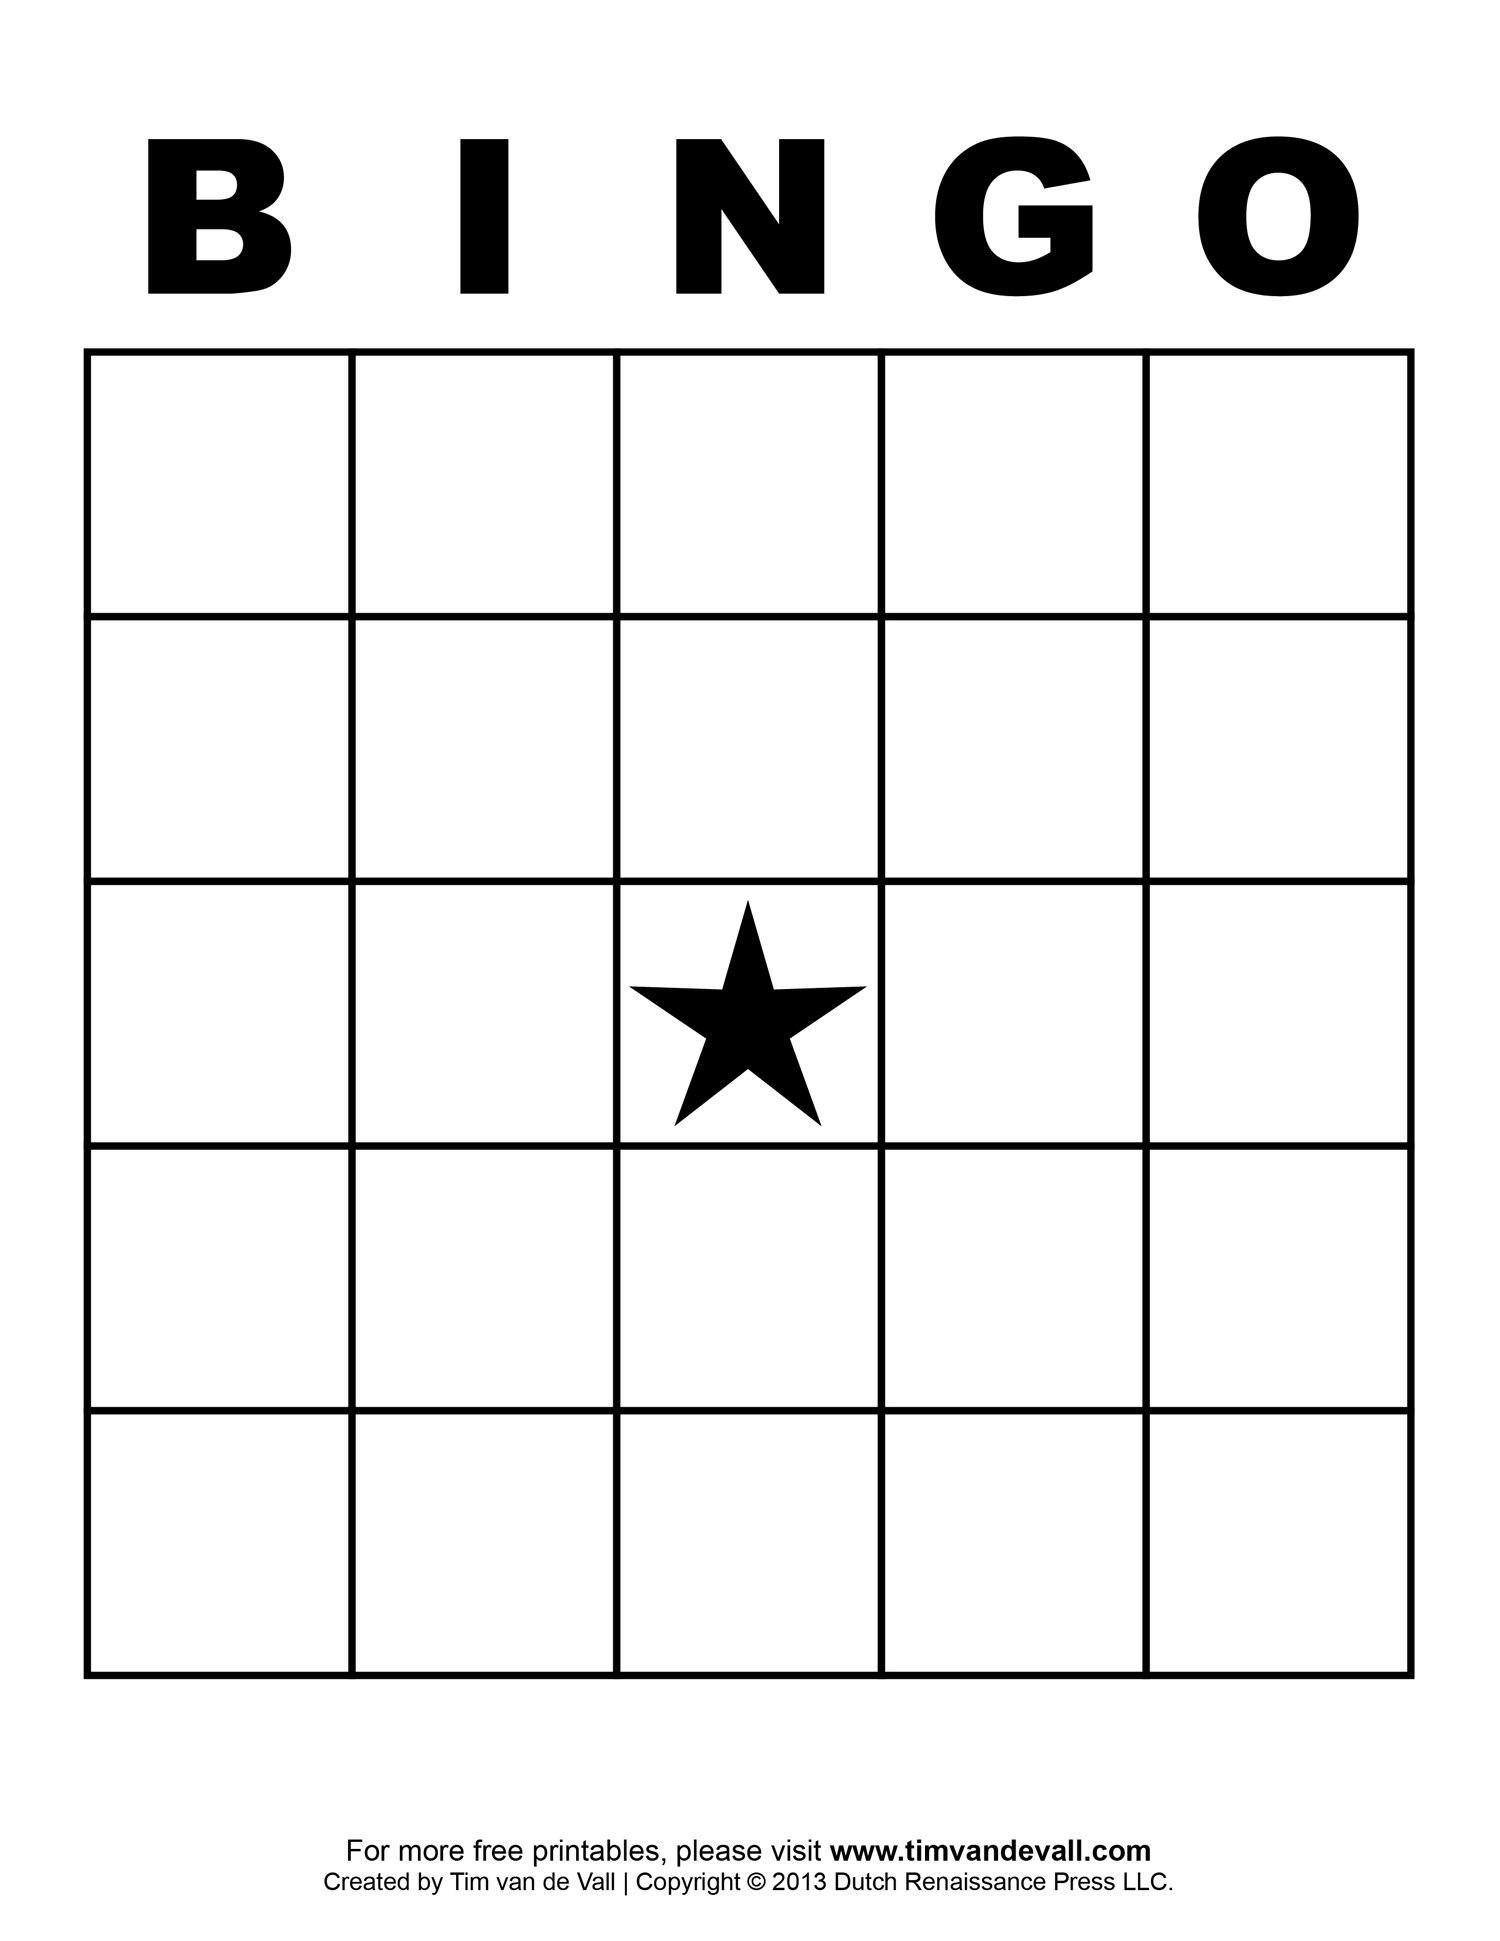 Bingo Card Template  Chartreusemodern Pertaining To Bingo Card Template Word